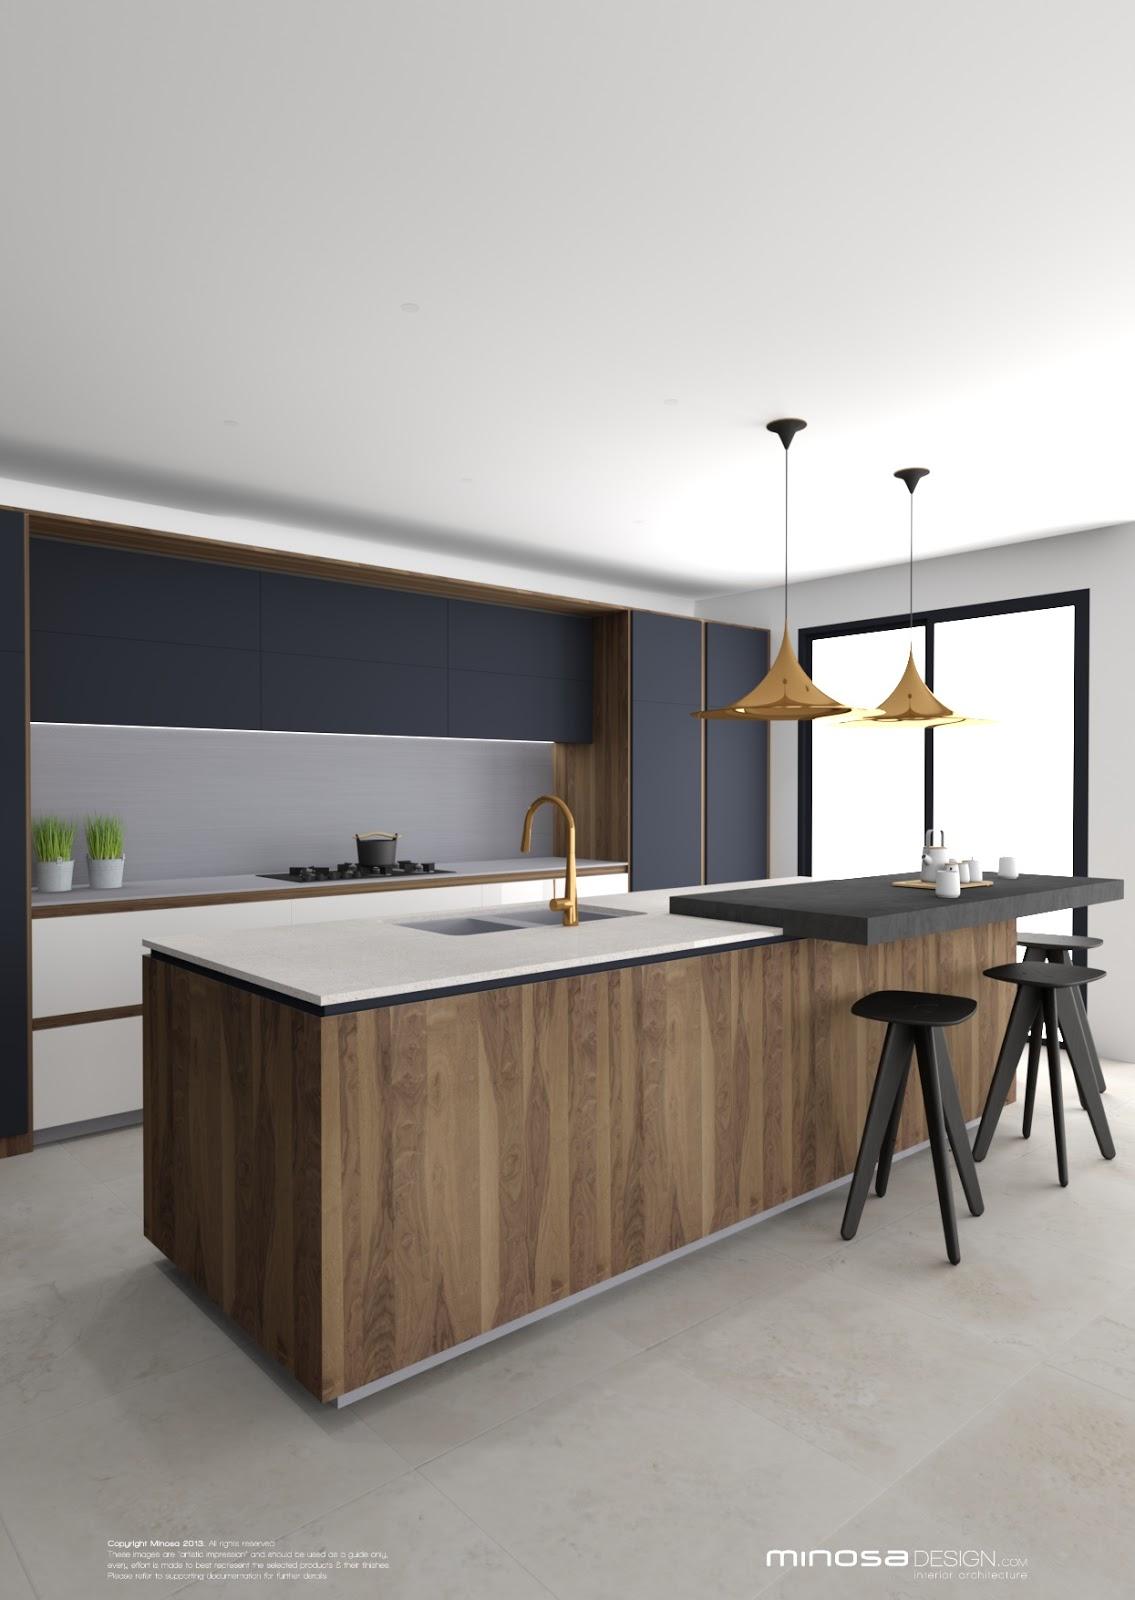 kitchen island, wood surface, white top, black board, white cabinet, grey backsplash wall, dark grey cupboard